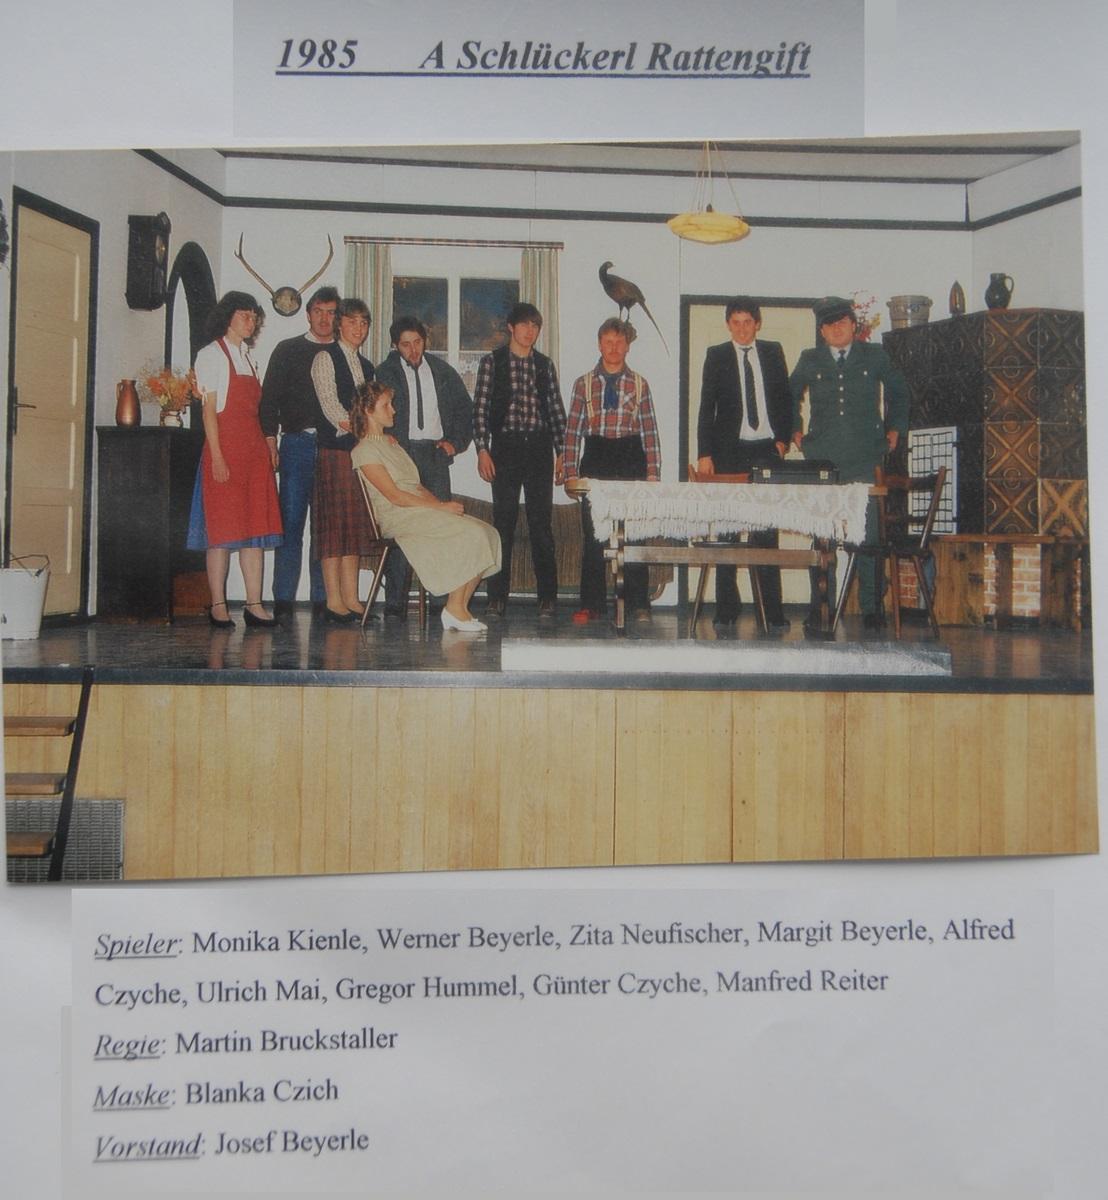 KSC-Theater-1985-A-Schlueckerl-Rattengift